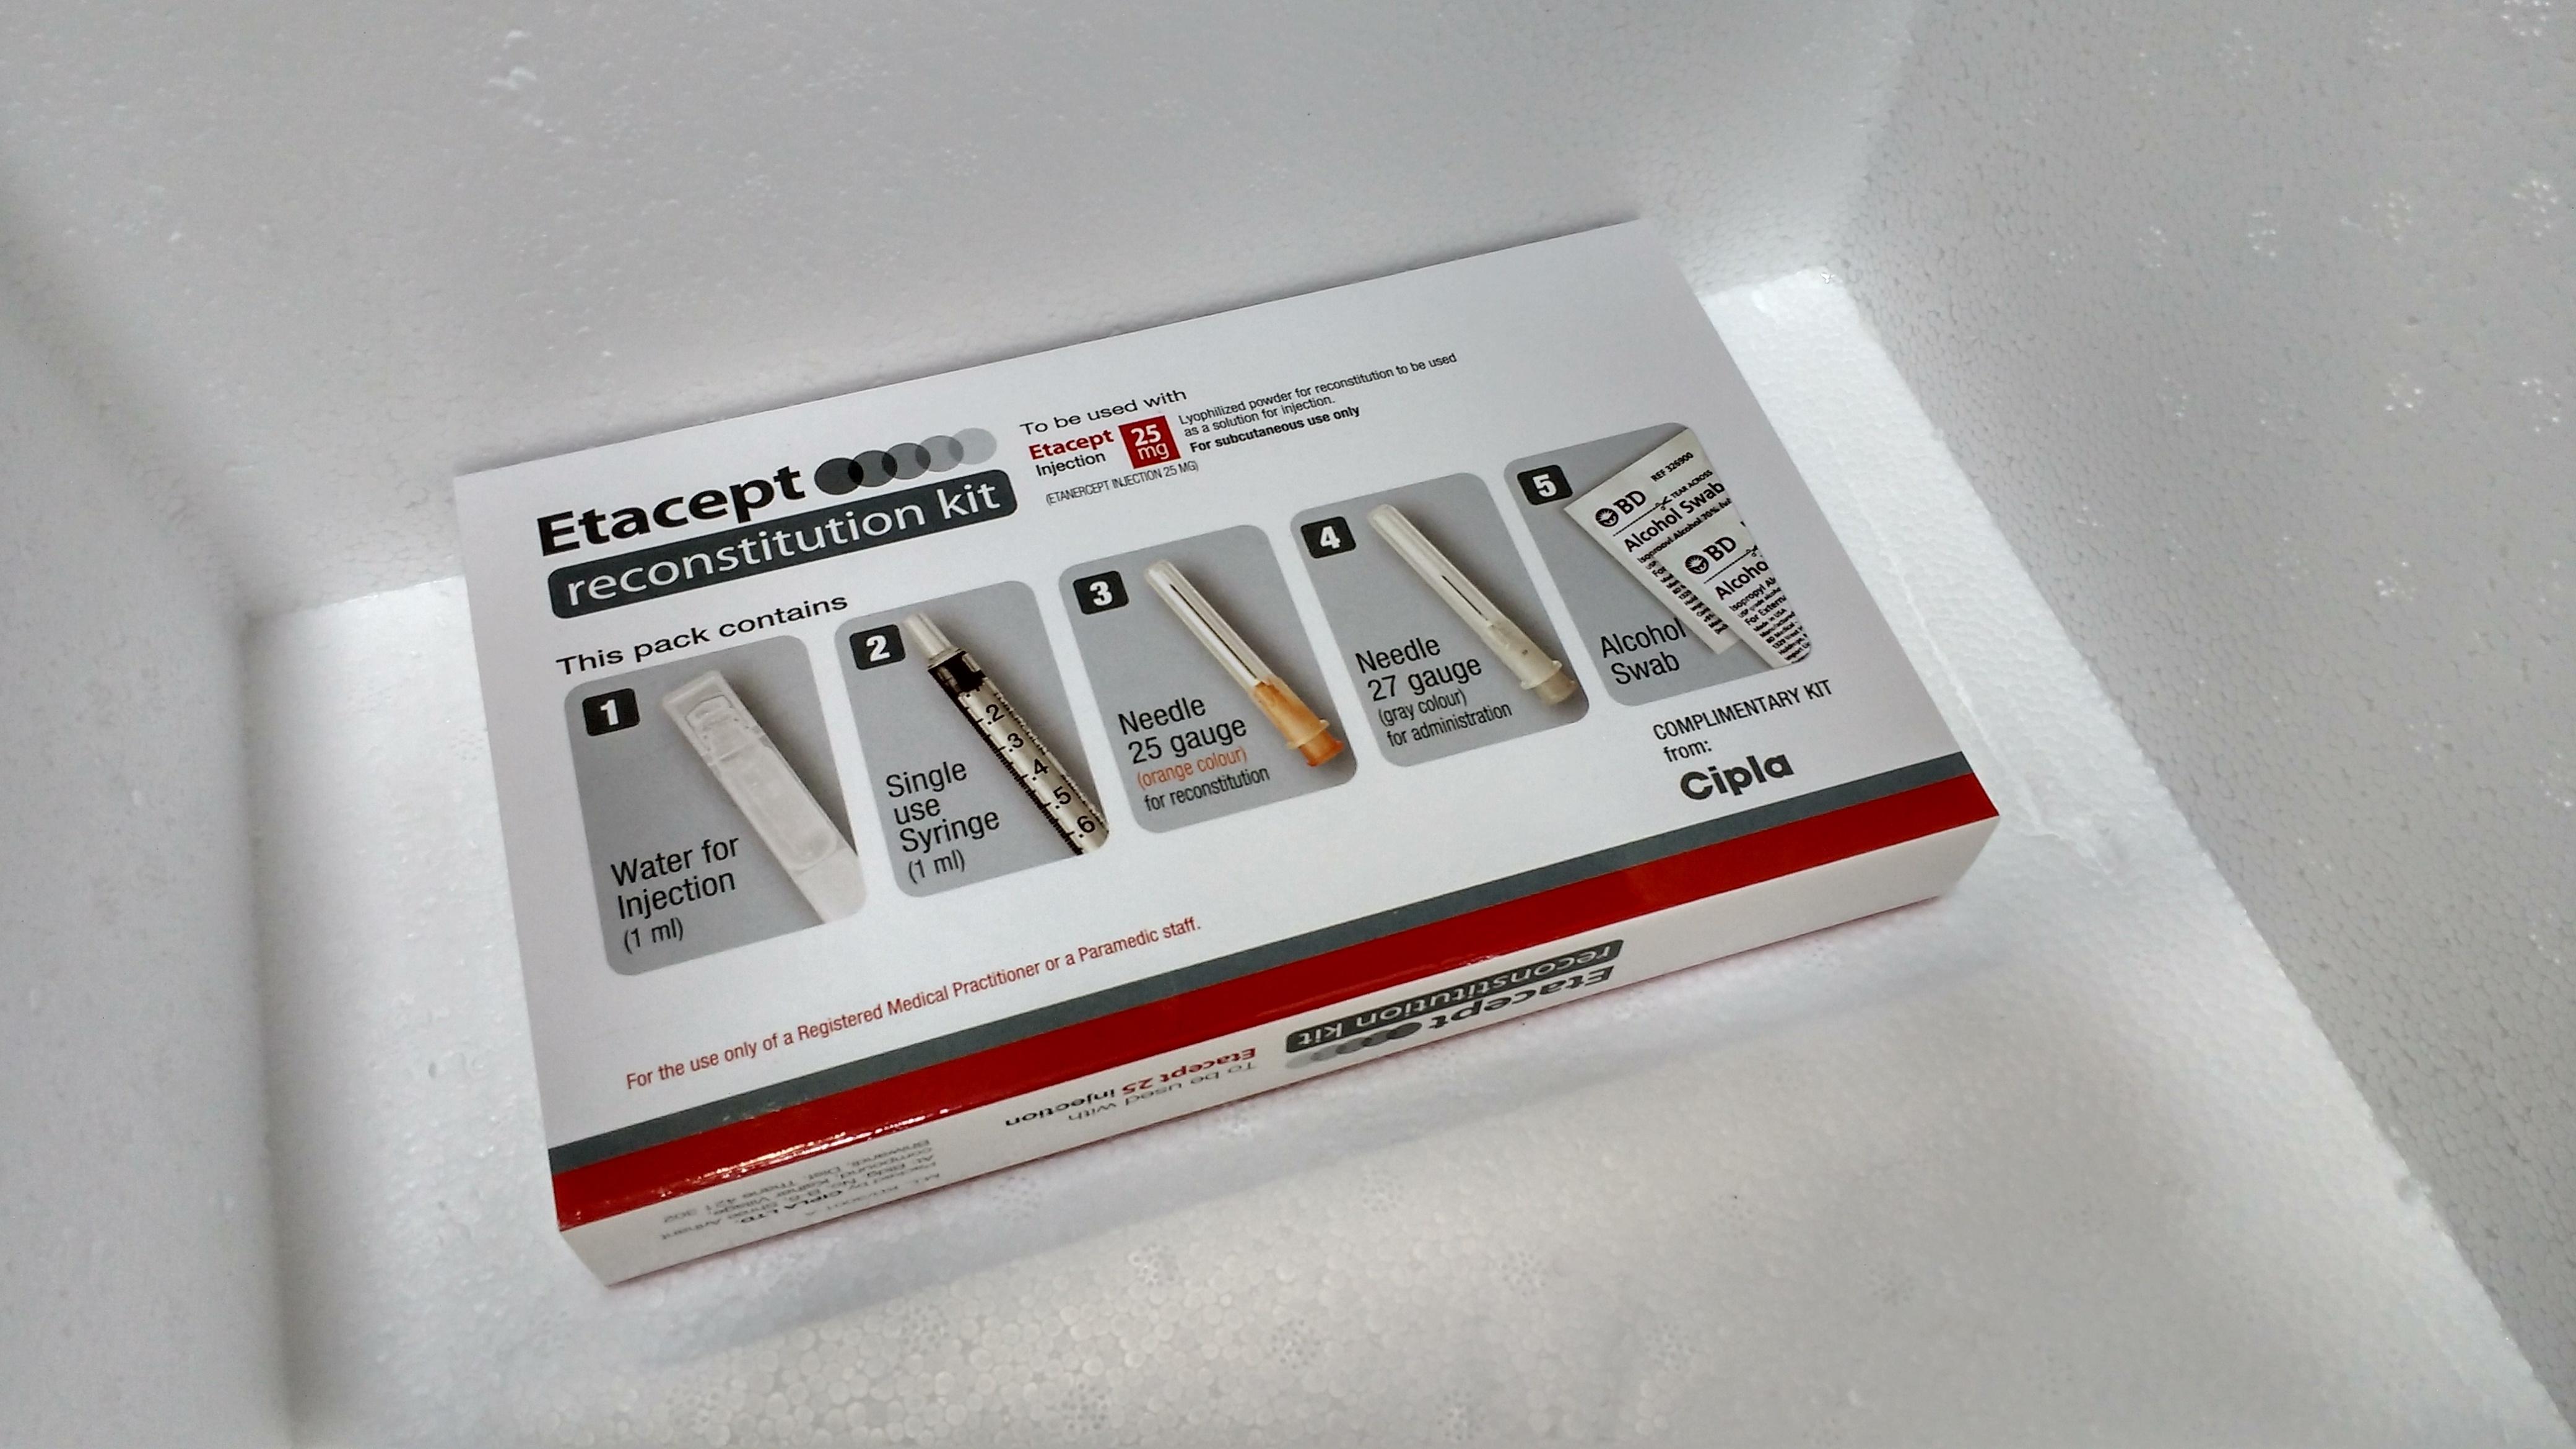 Etacept 25mg & Etacept Kit